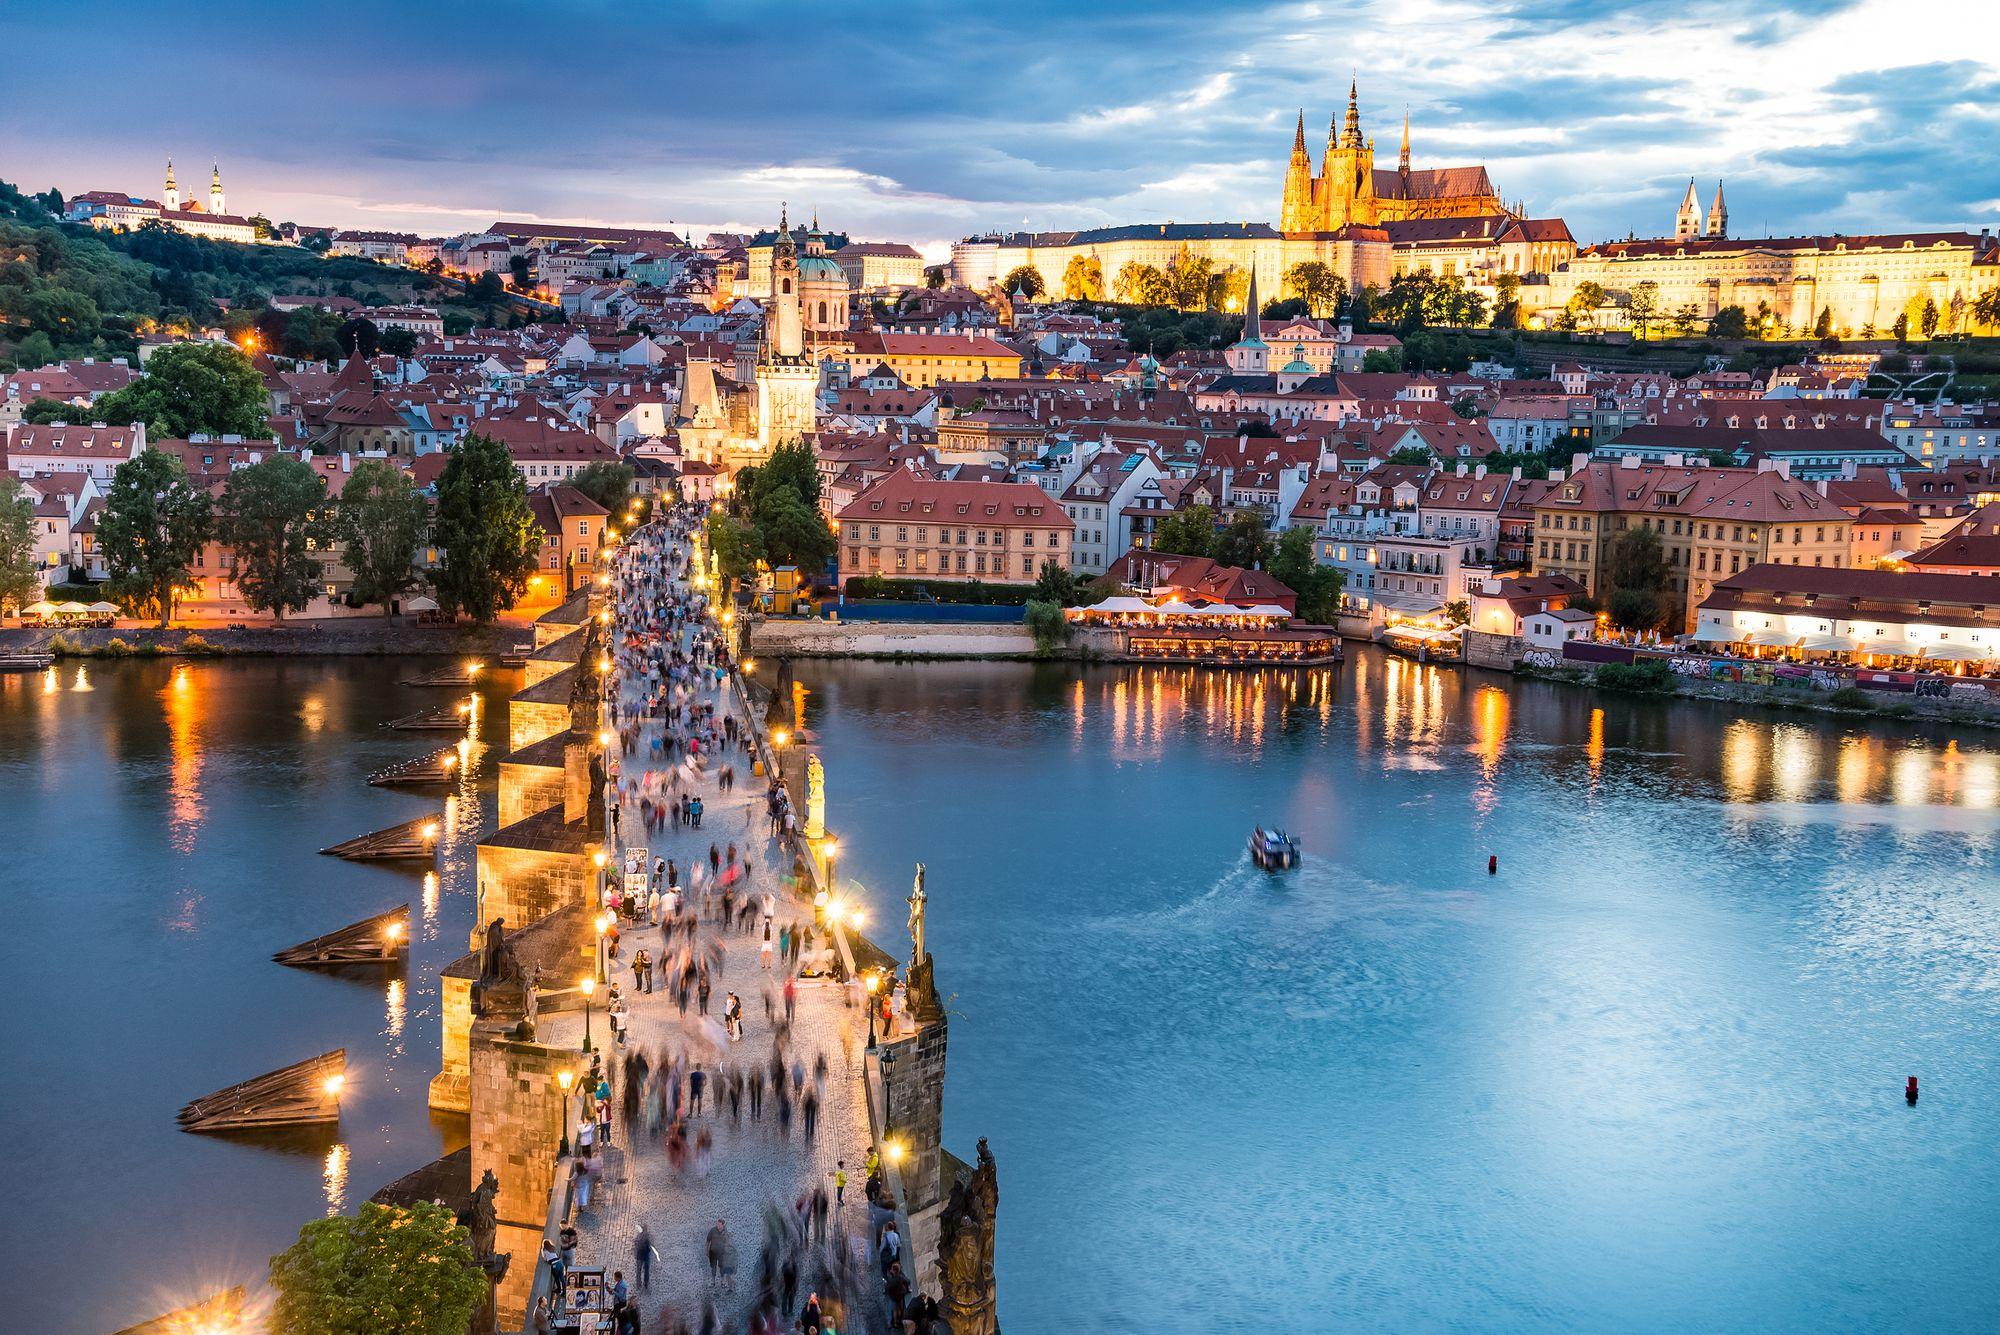 30 Best Things to Do in Prague, Czech Republic